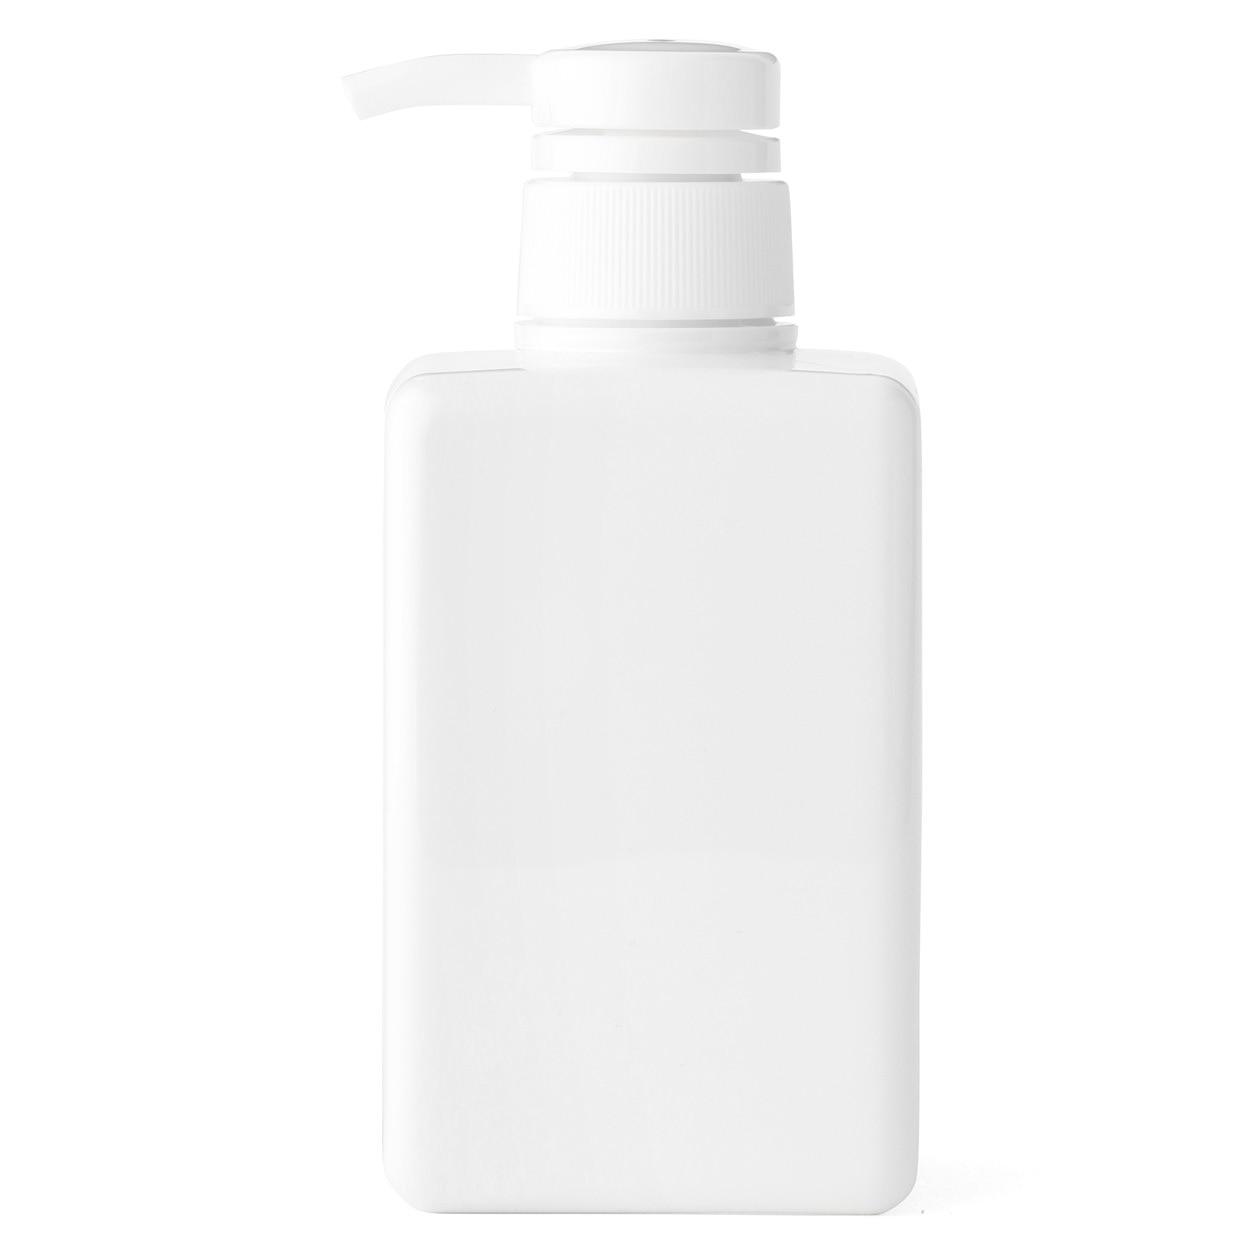 PET詰替ボトル ホワイト 400ml用 ホワイトの写真